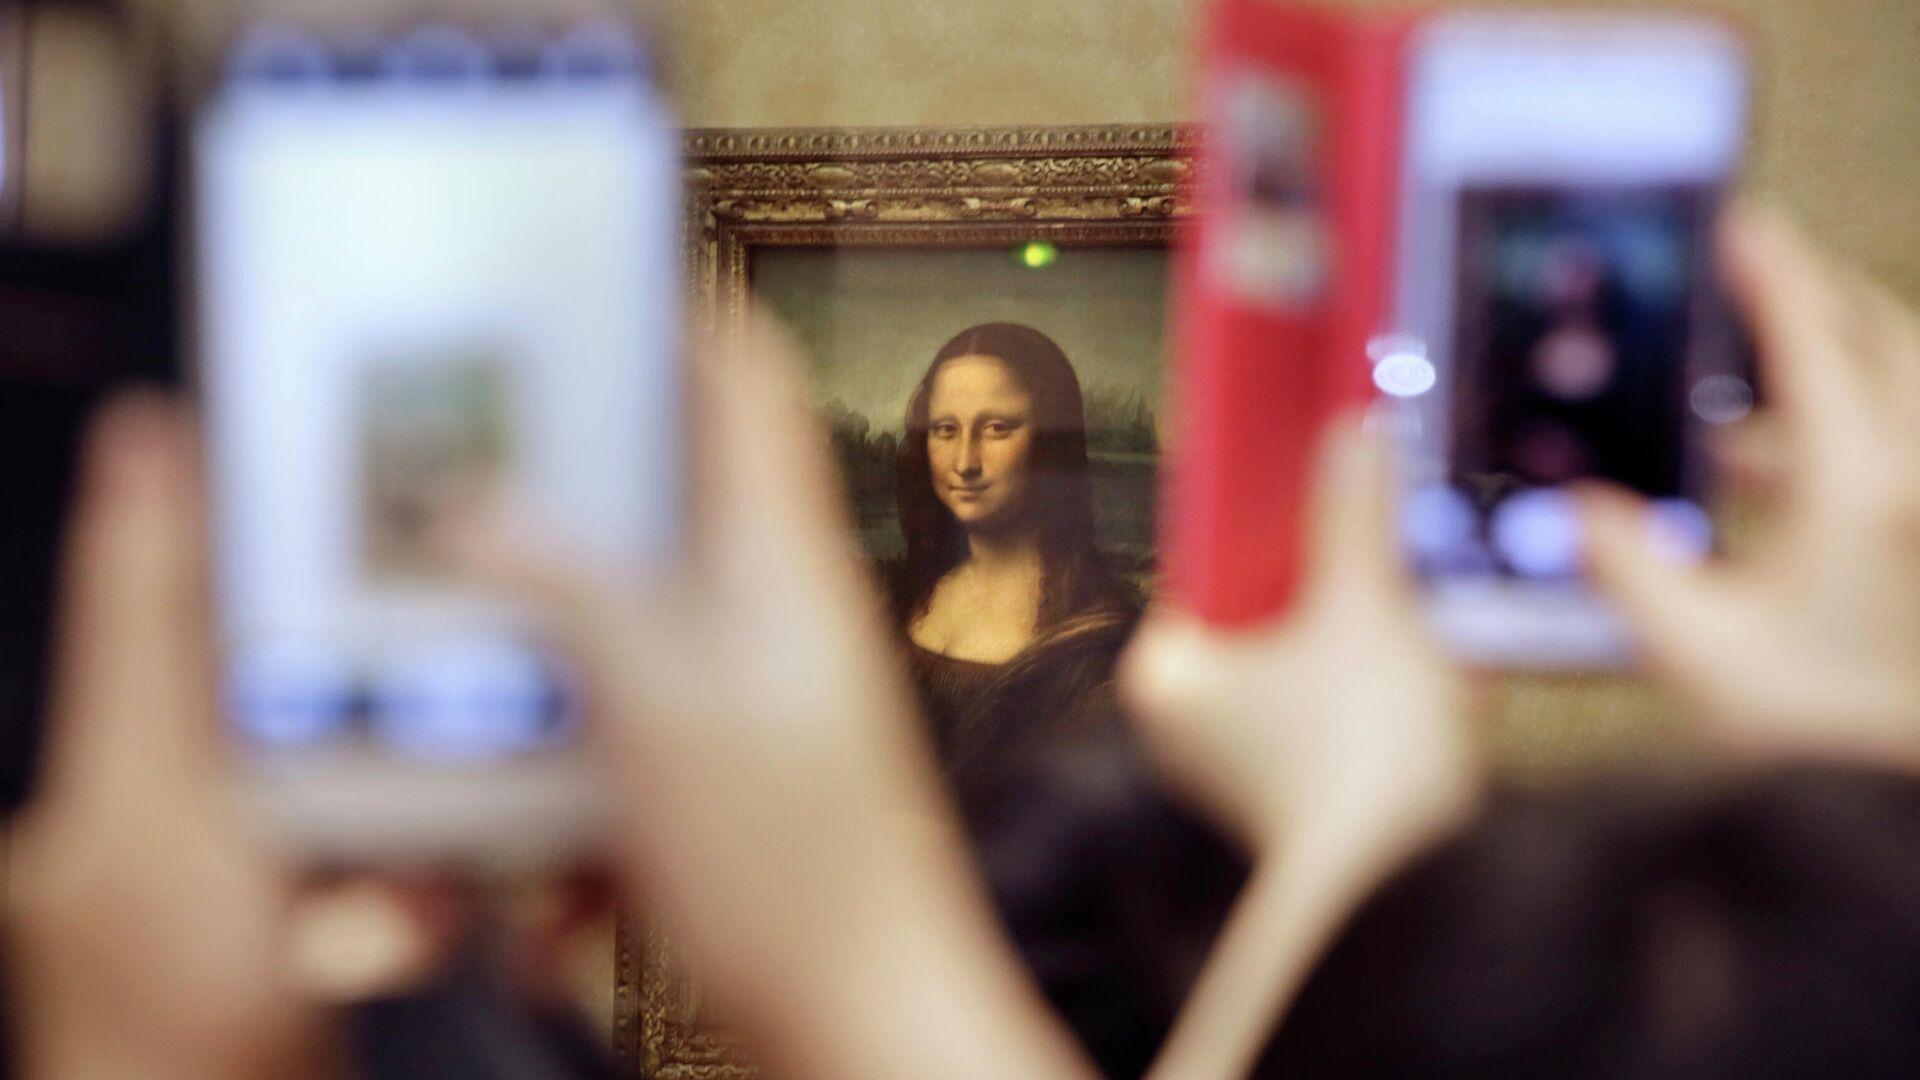 Картина Леонардо де Винчи Мона Лиза в Лувре  - РИА Новости, 1920, 10.01.2021